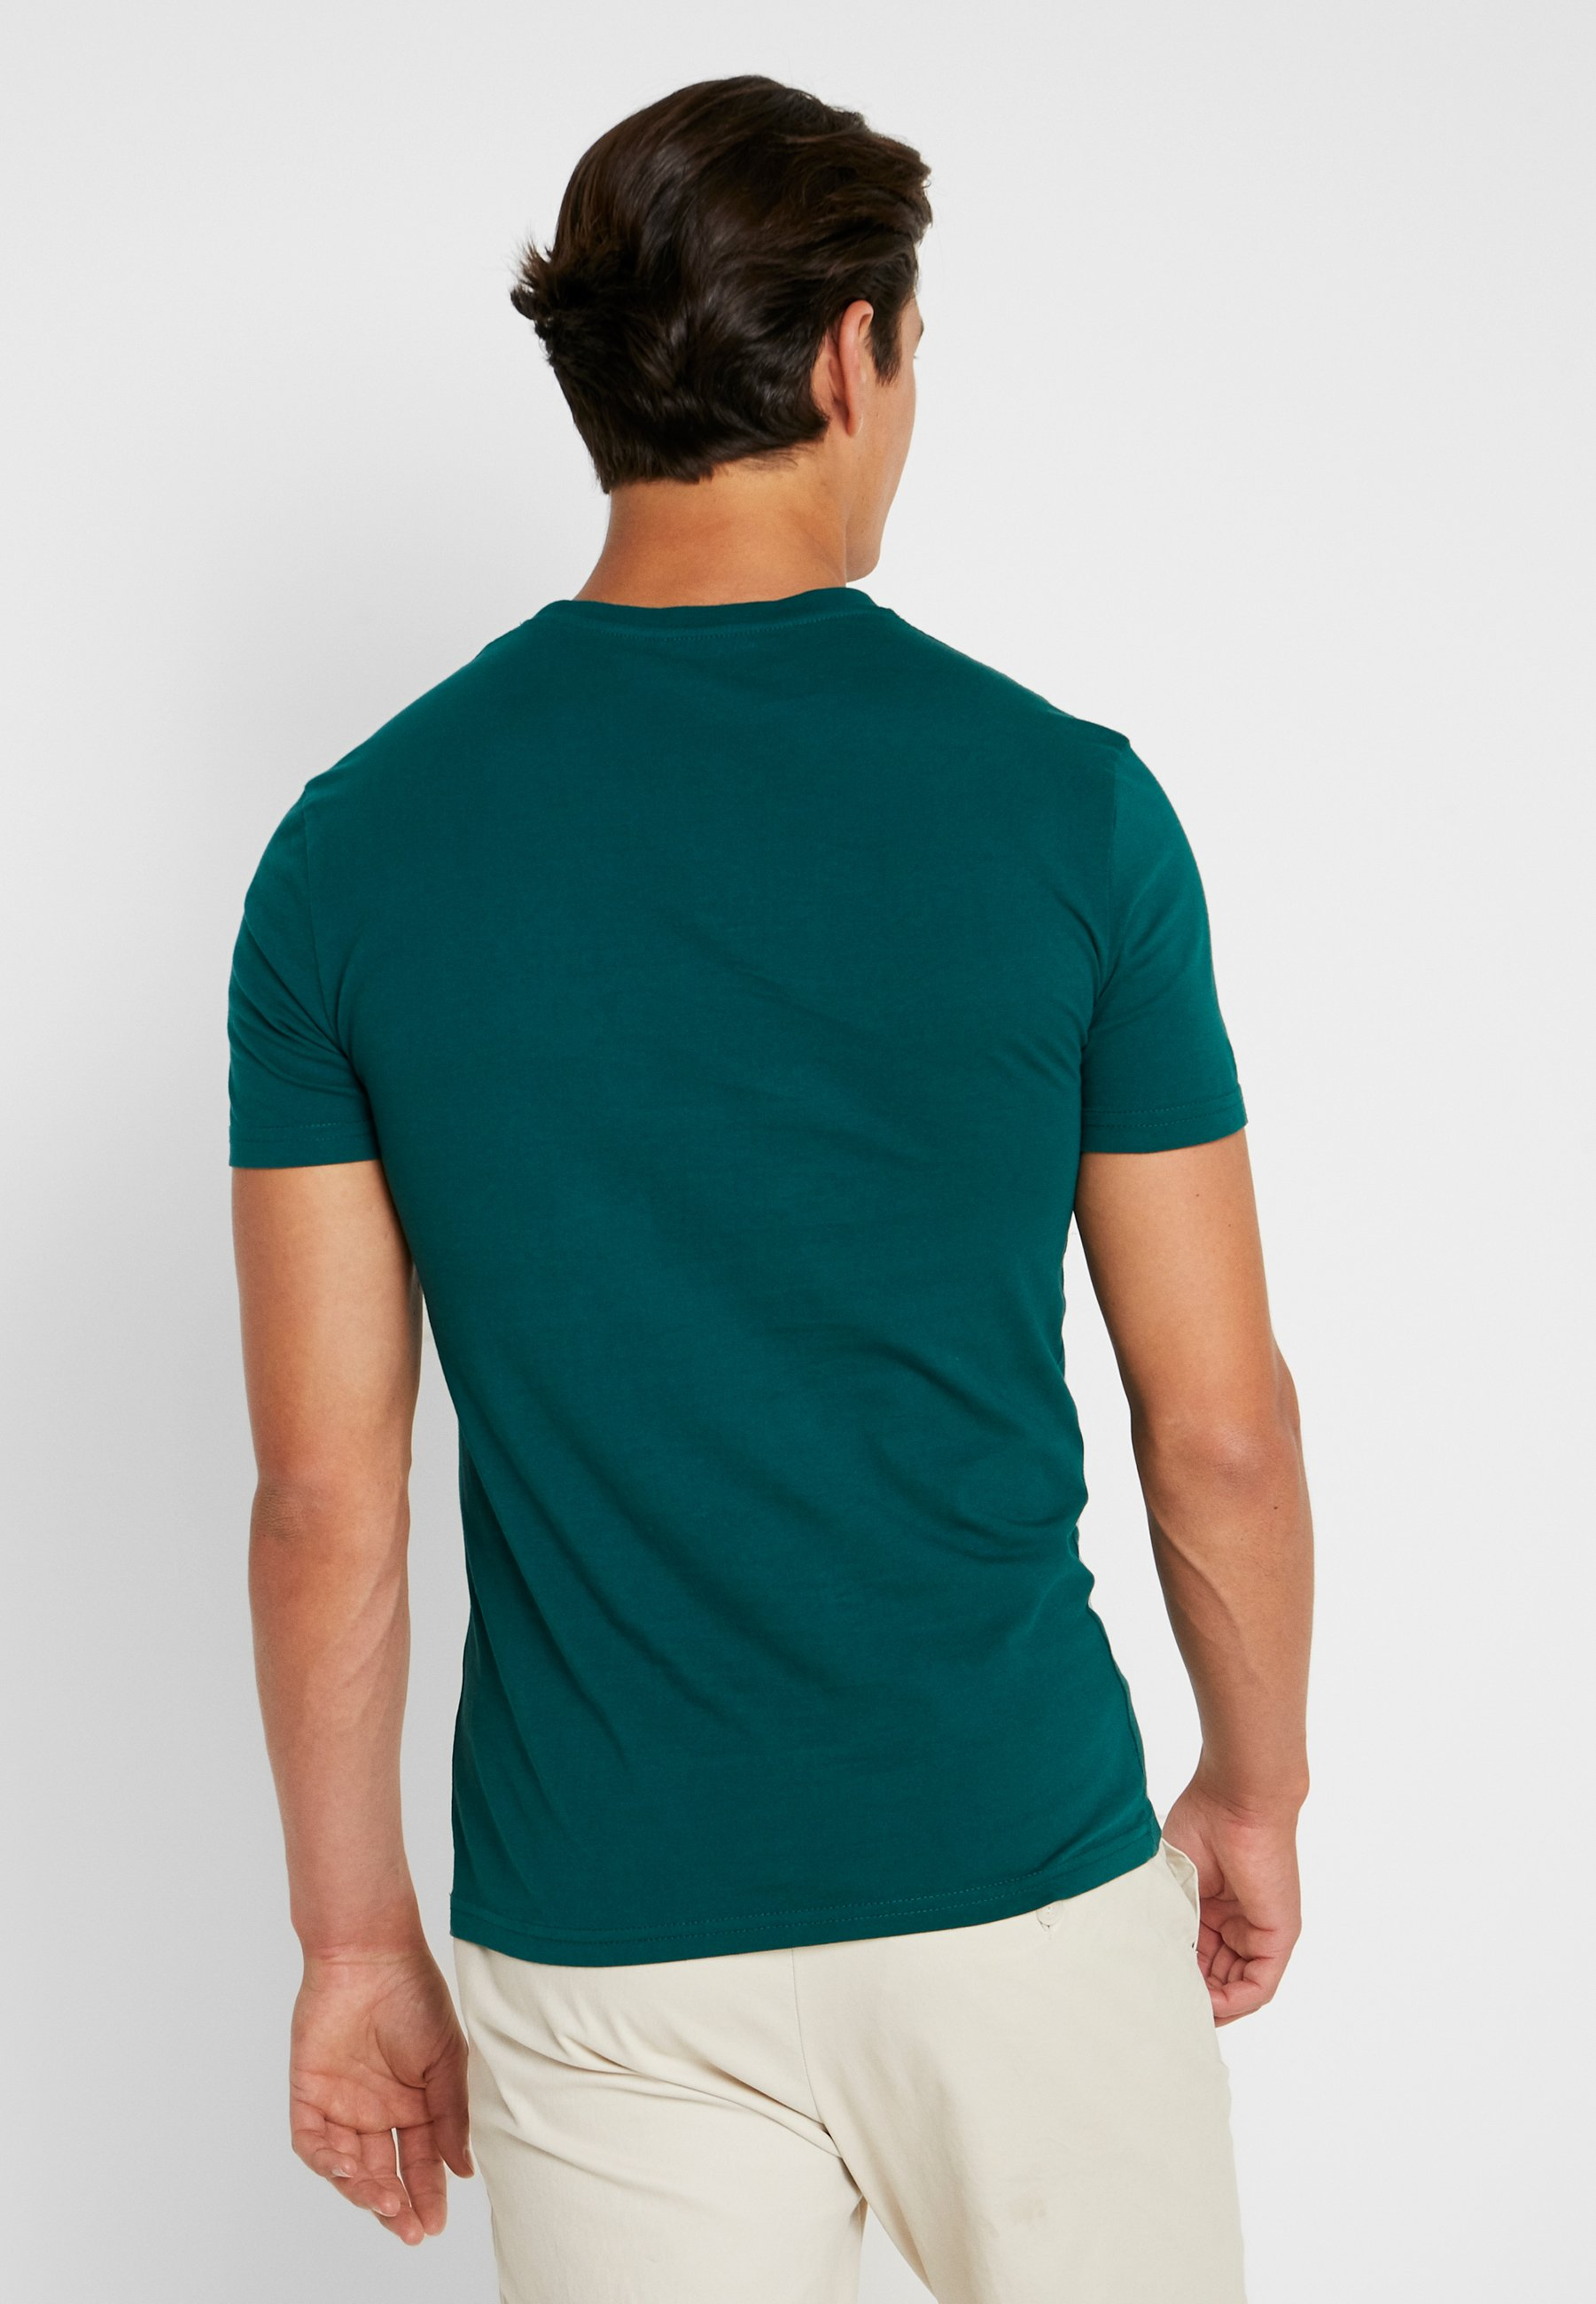 T Green ImpriméDark shirt Pier One wTPZOkXiul